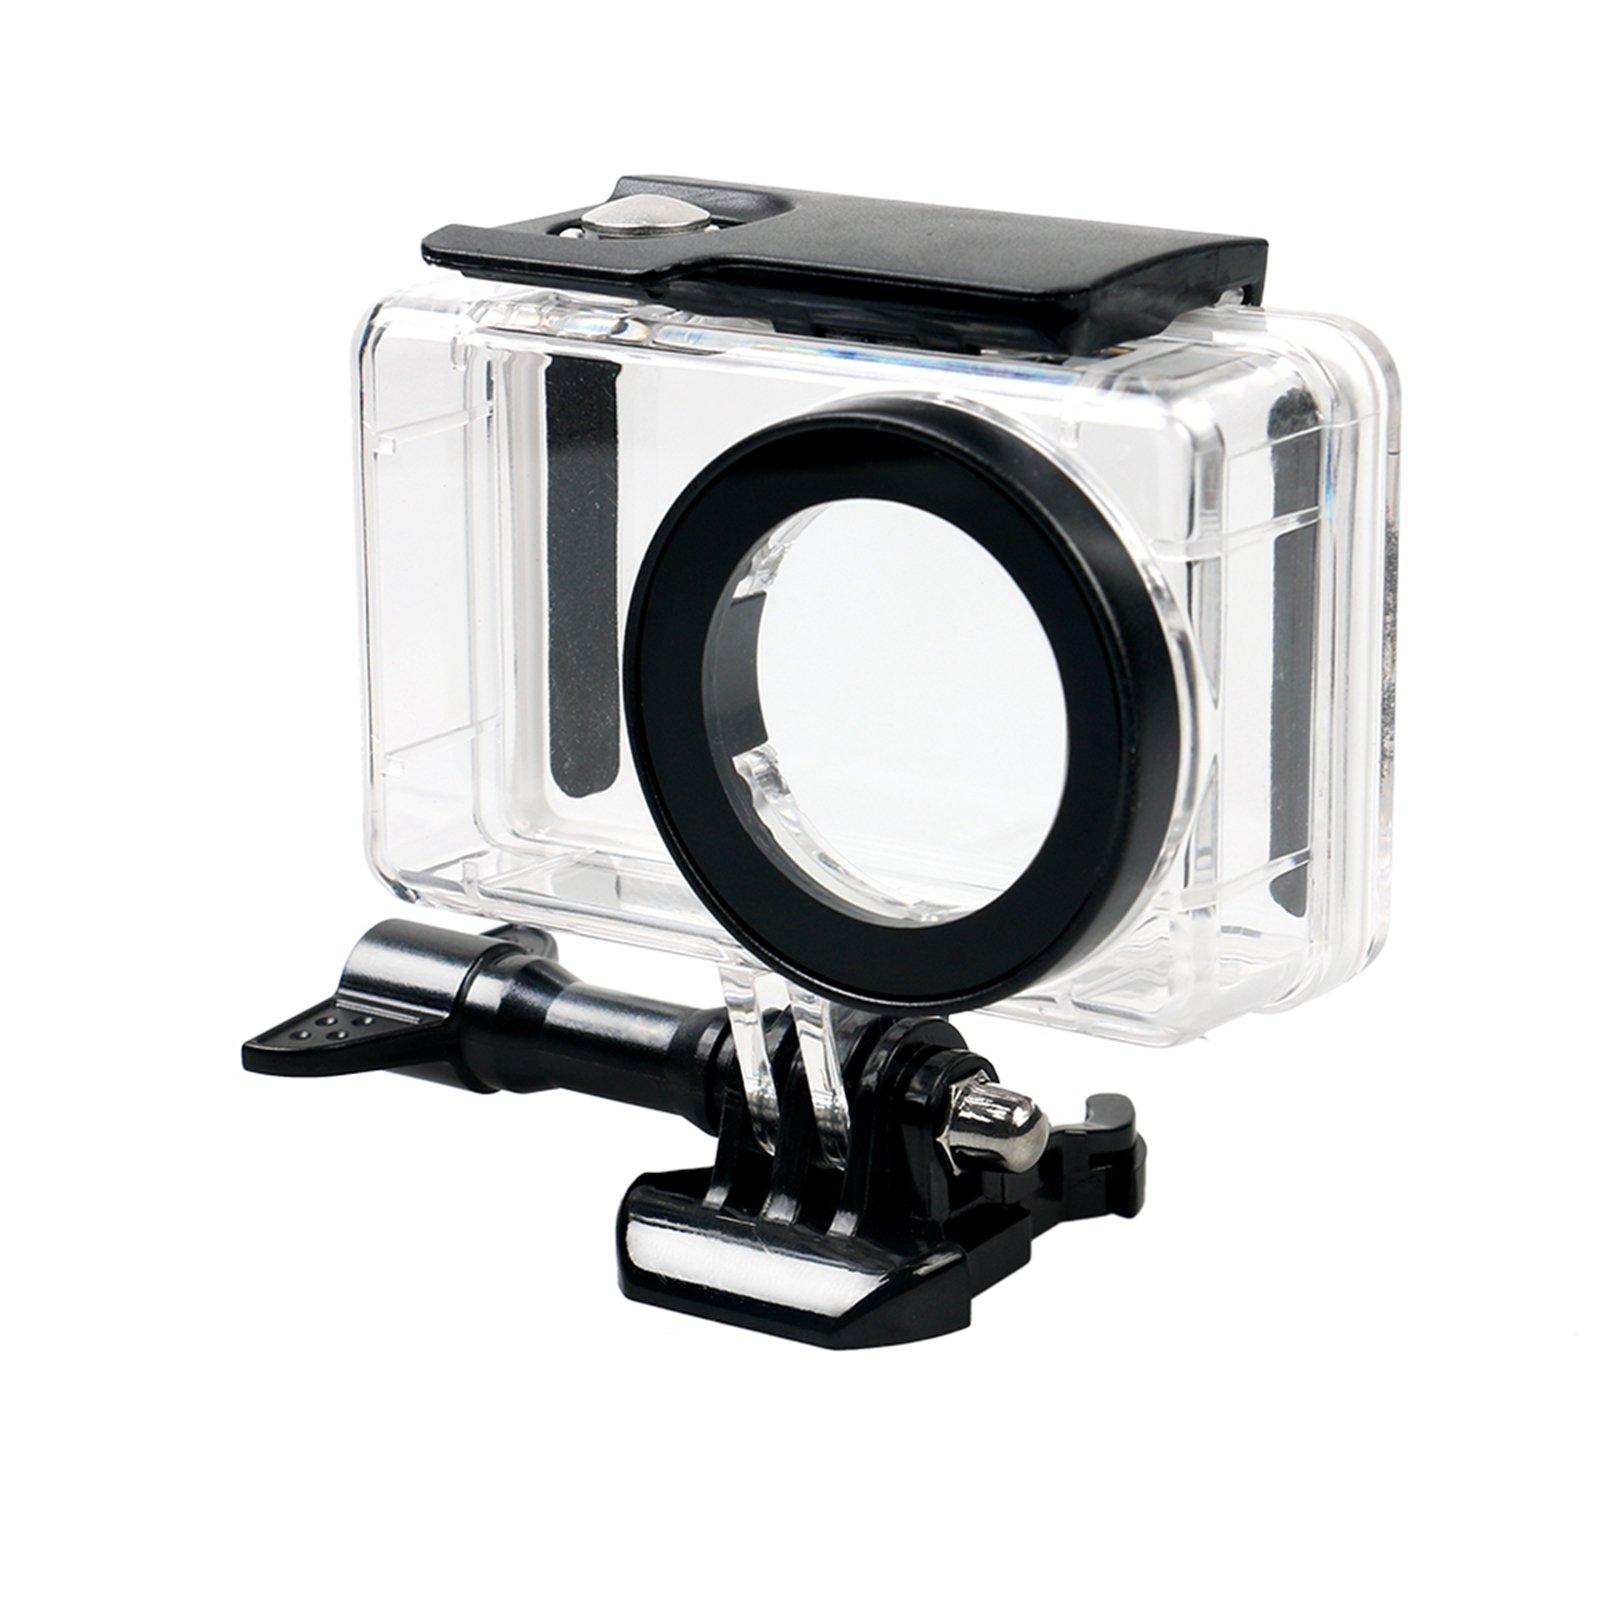 XBERSTAR 45m Waterproof Housing Case Porotective Box for Xiaomi Mijia 4K Mini Action Camera